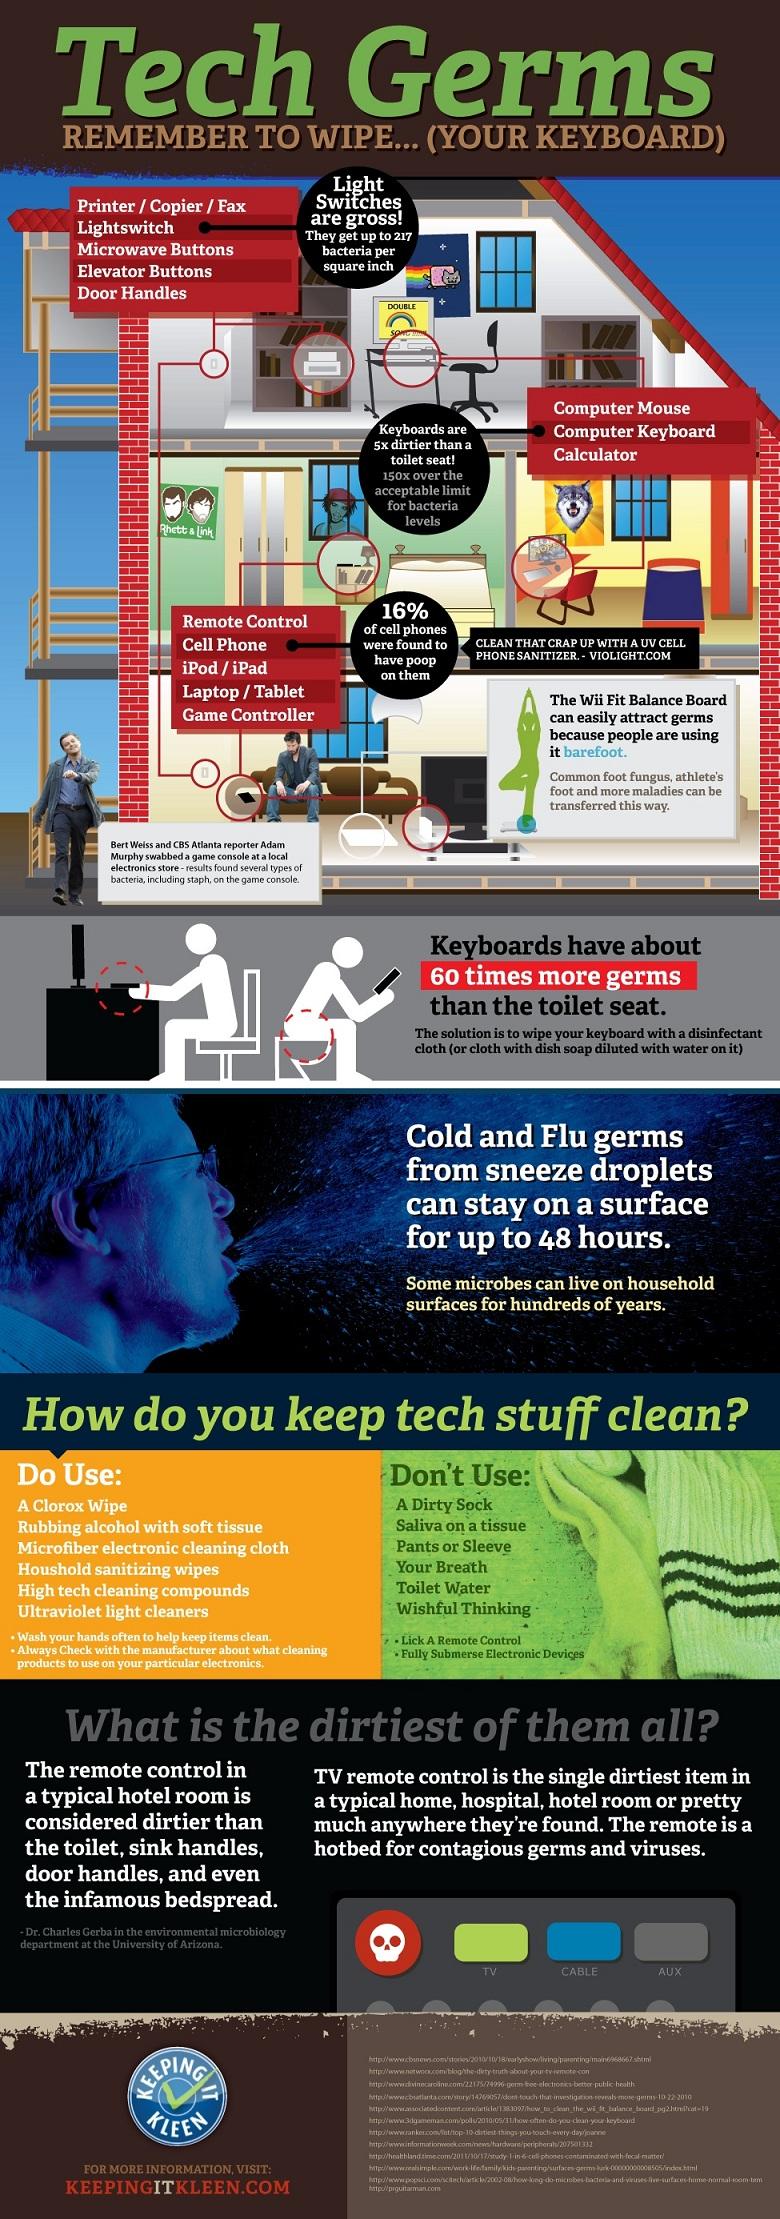 Keeping it Kleen,gadgets,infographics,infographic,cellphones,germs,dirt